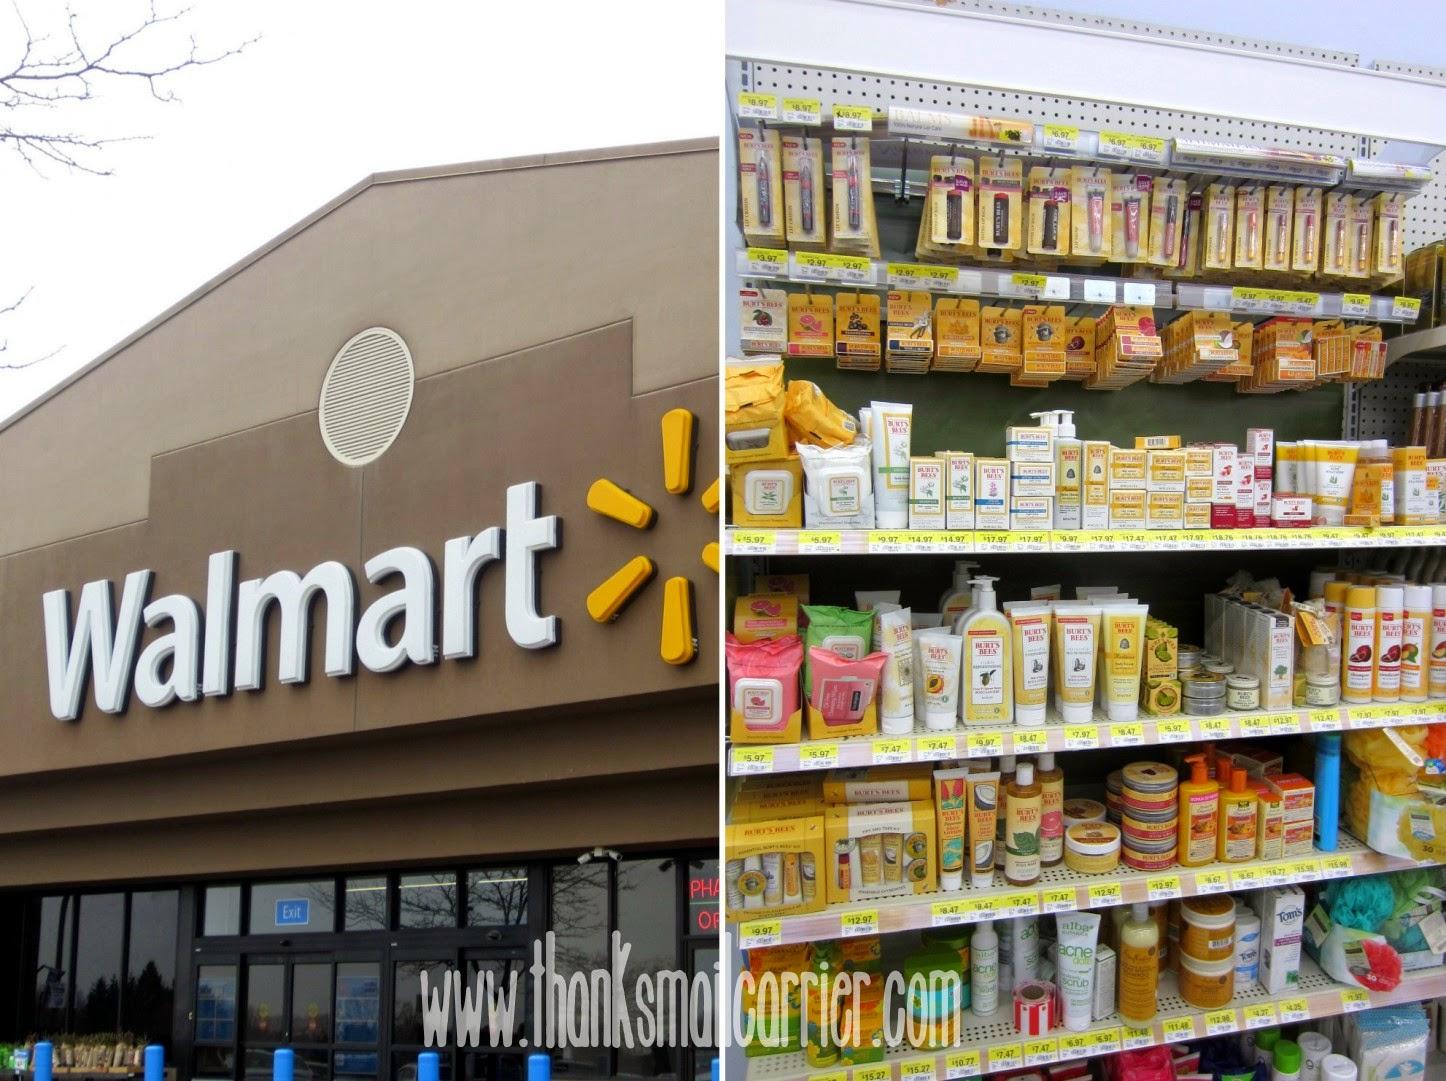 Burt's Bees at Walmart